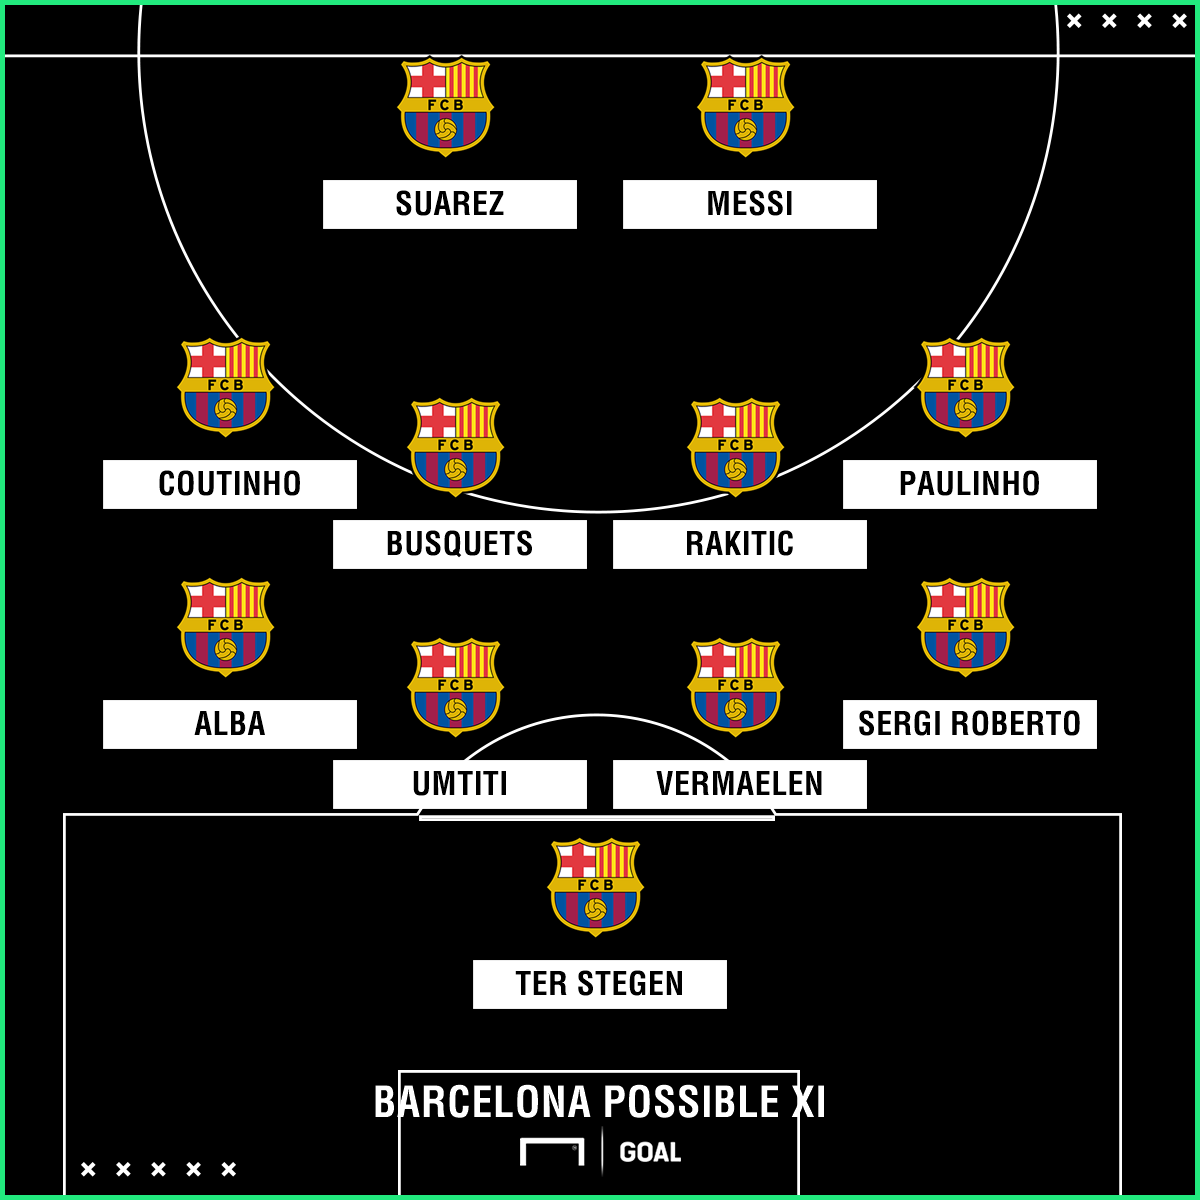 Barcelona possible Malaga